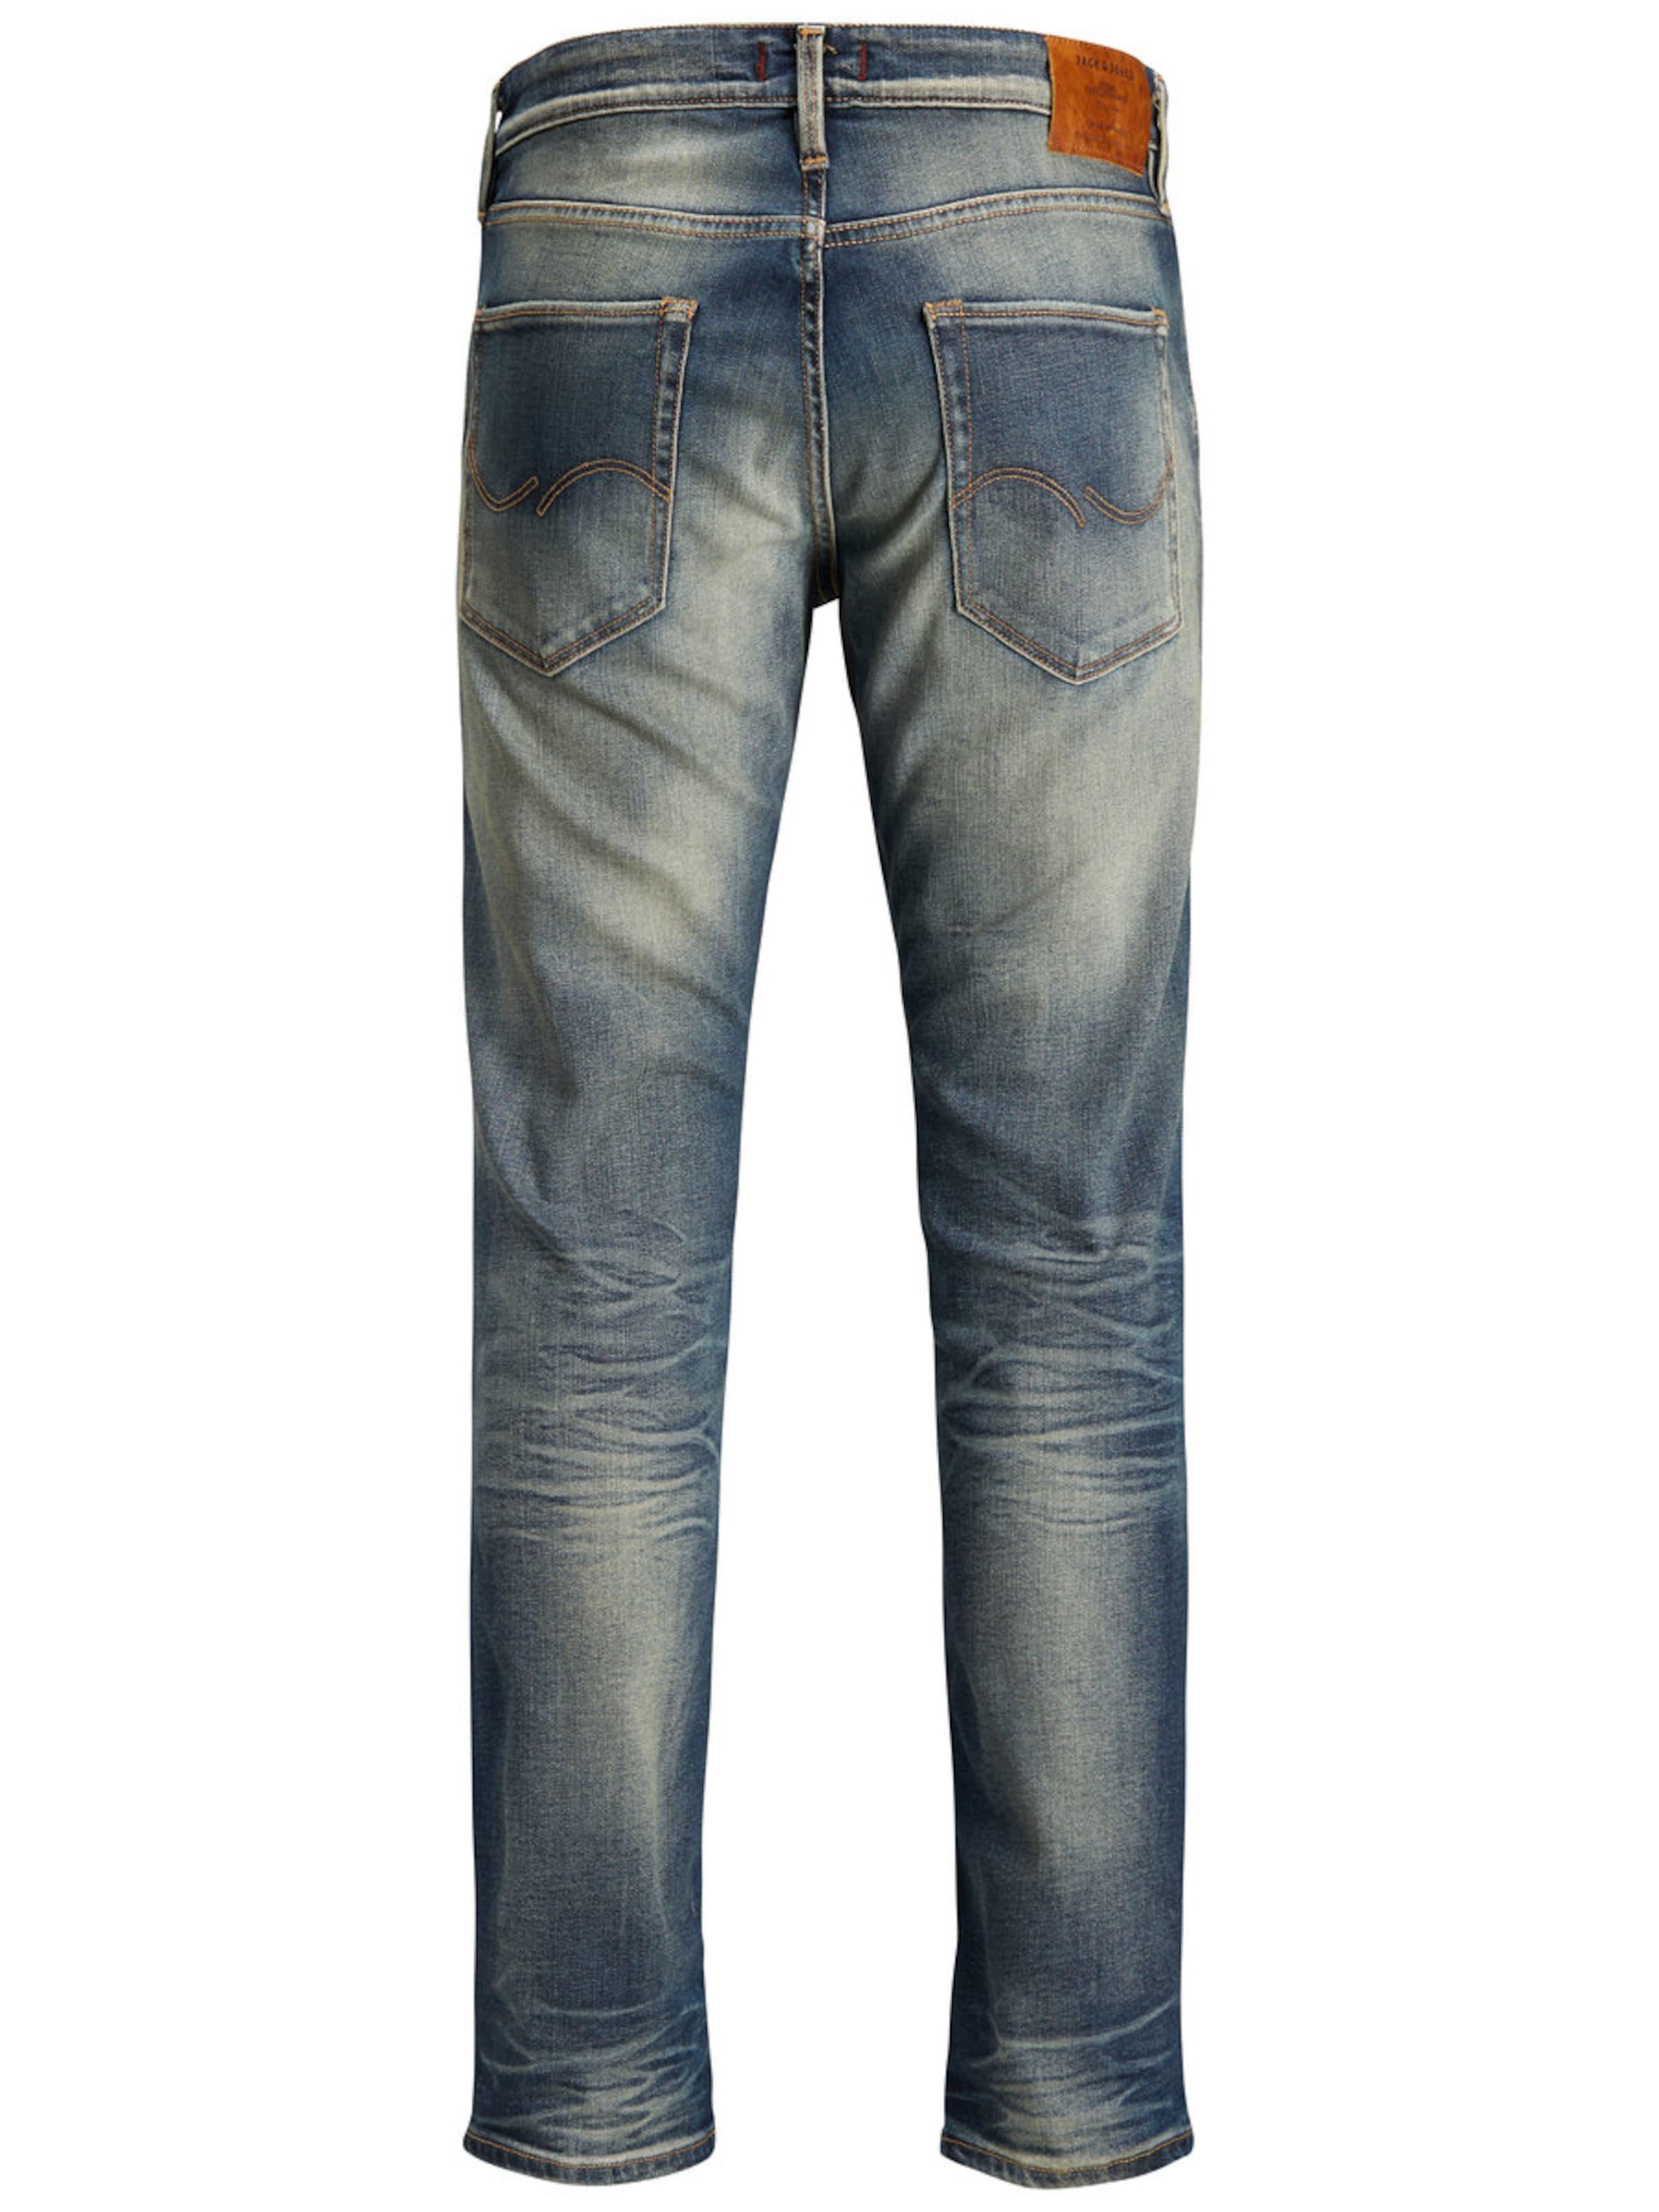 'mike In Bl Jackamp; Jones Denim Jeans 785' Blauw vN8On0wm